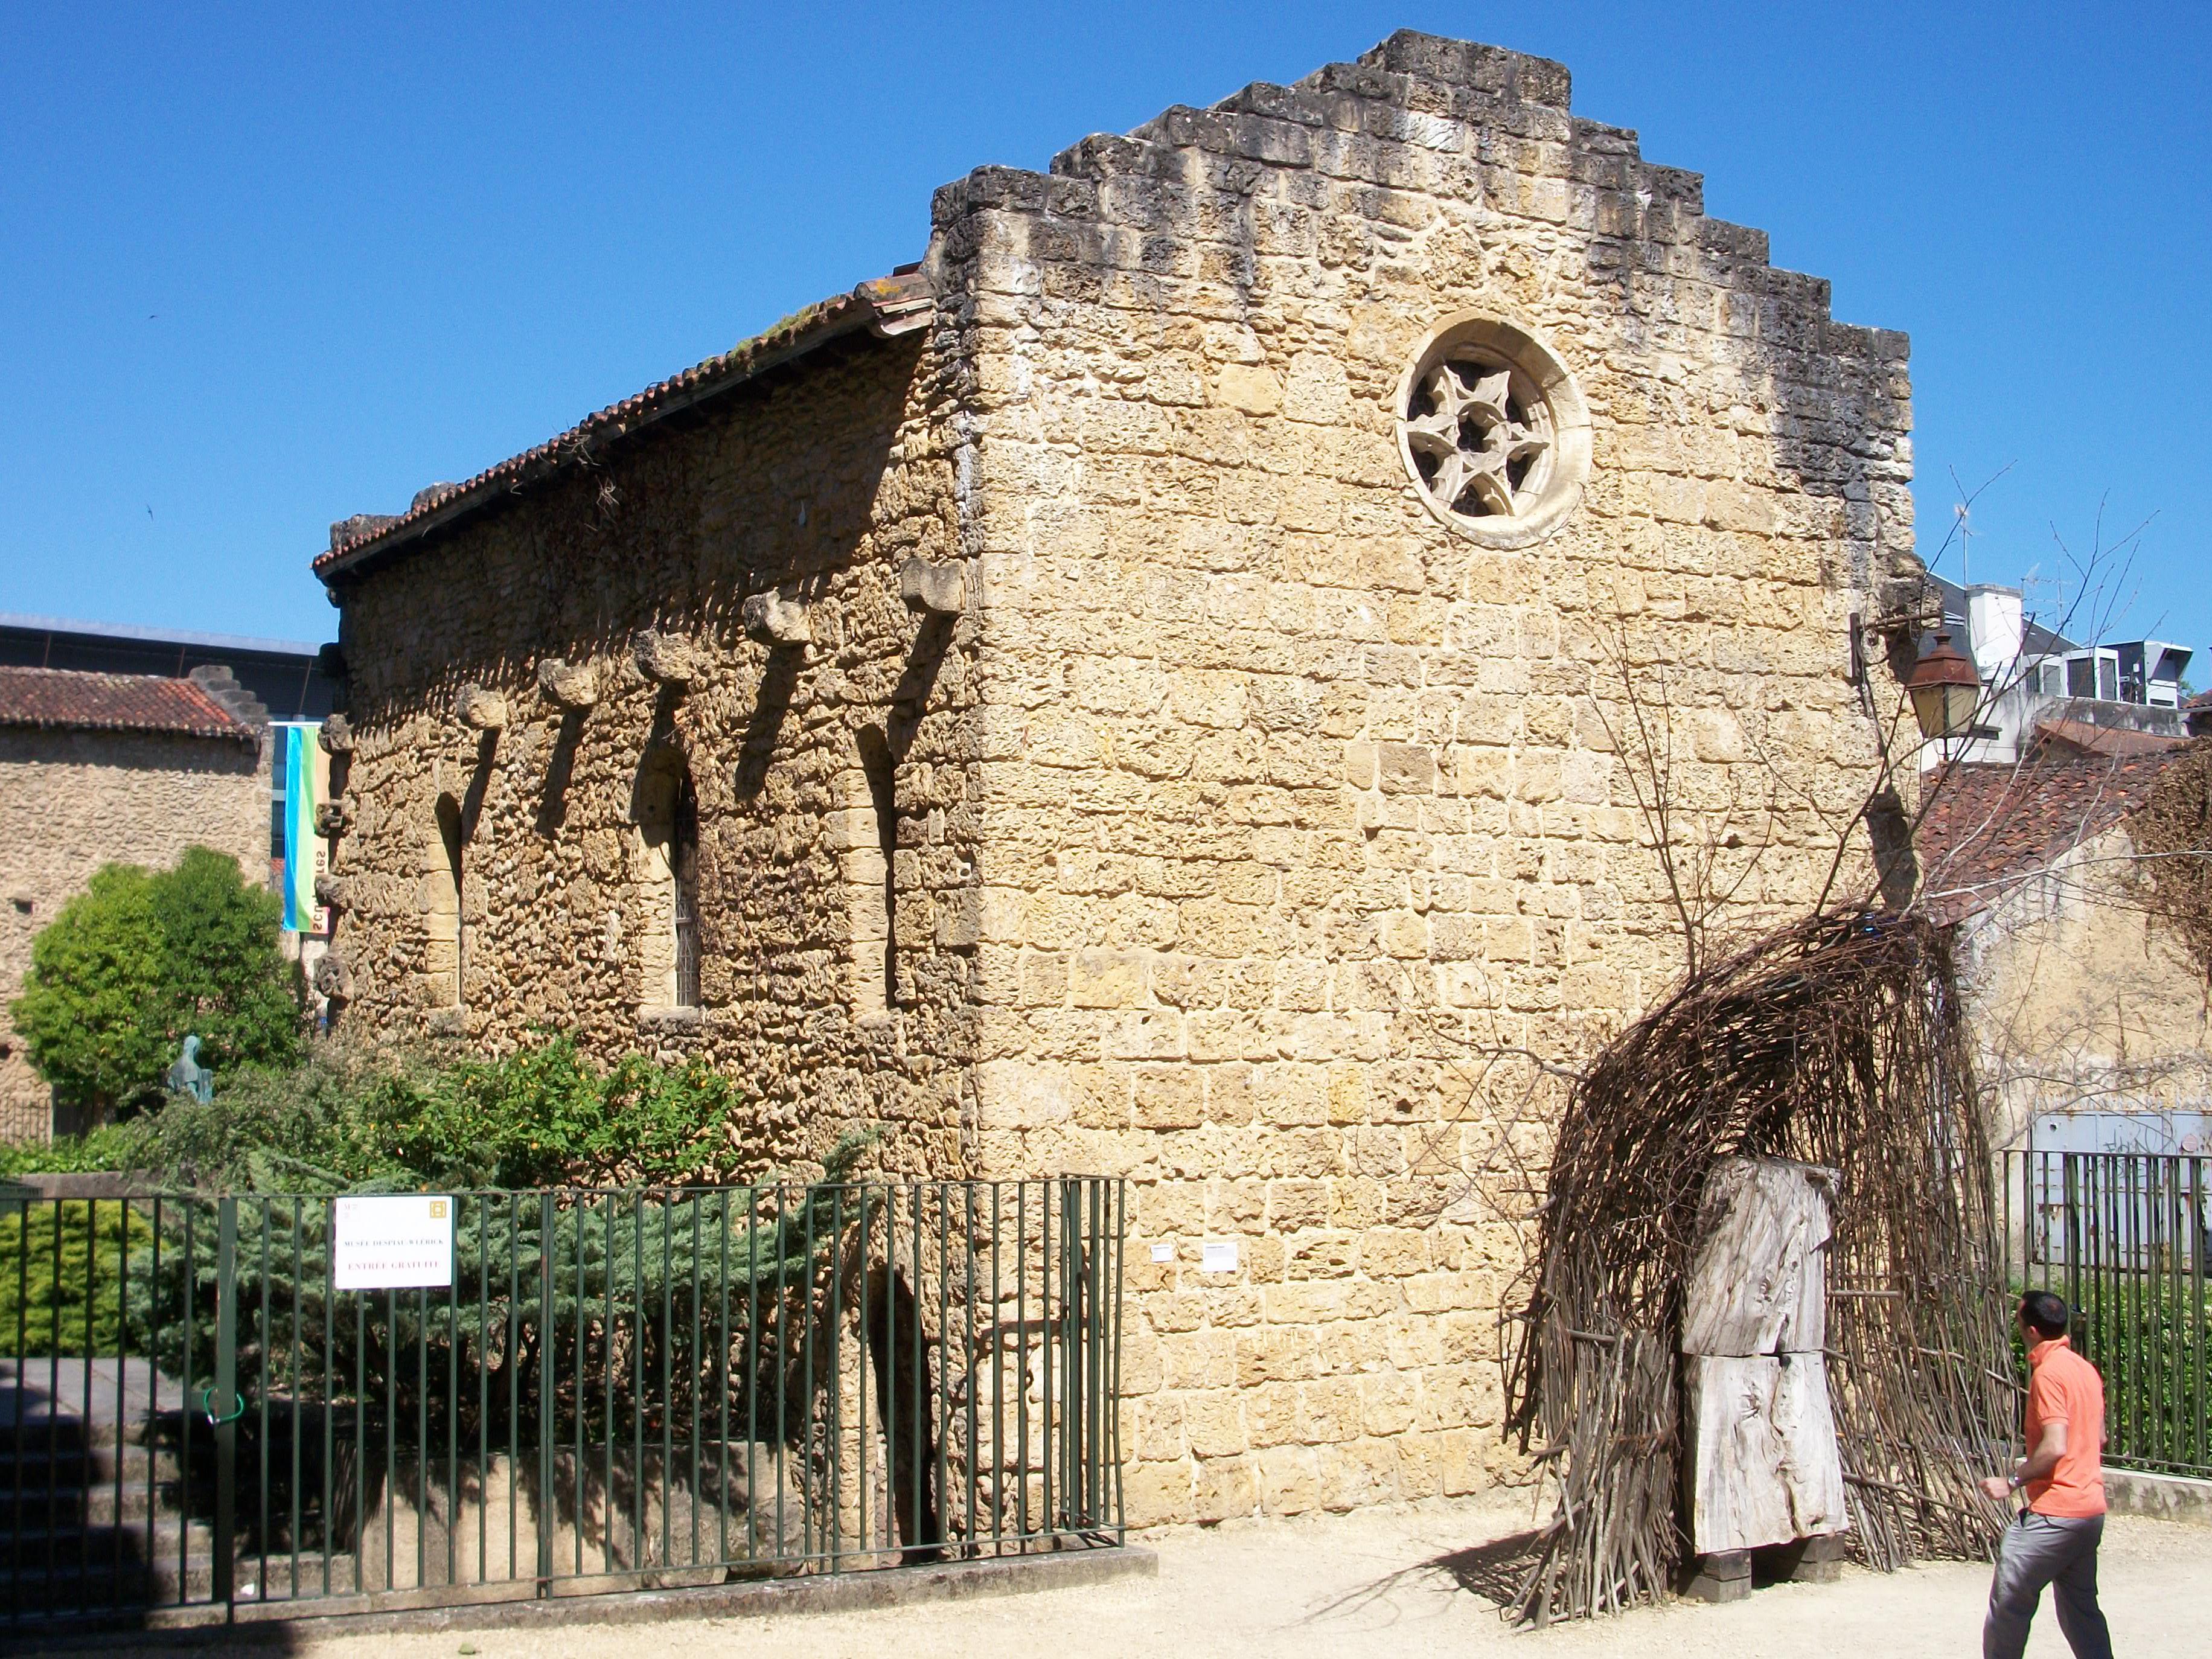 file ancienne chapelle romane mont de marsan france jpg wikimedia commons. Black Bedroom Furniture Sets. Home Design Ideas